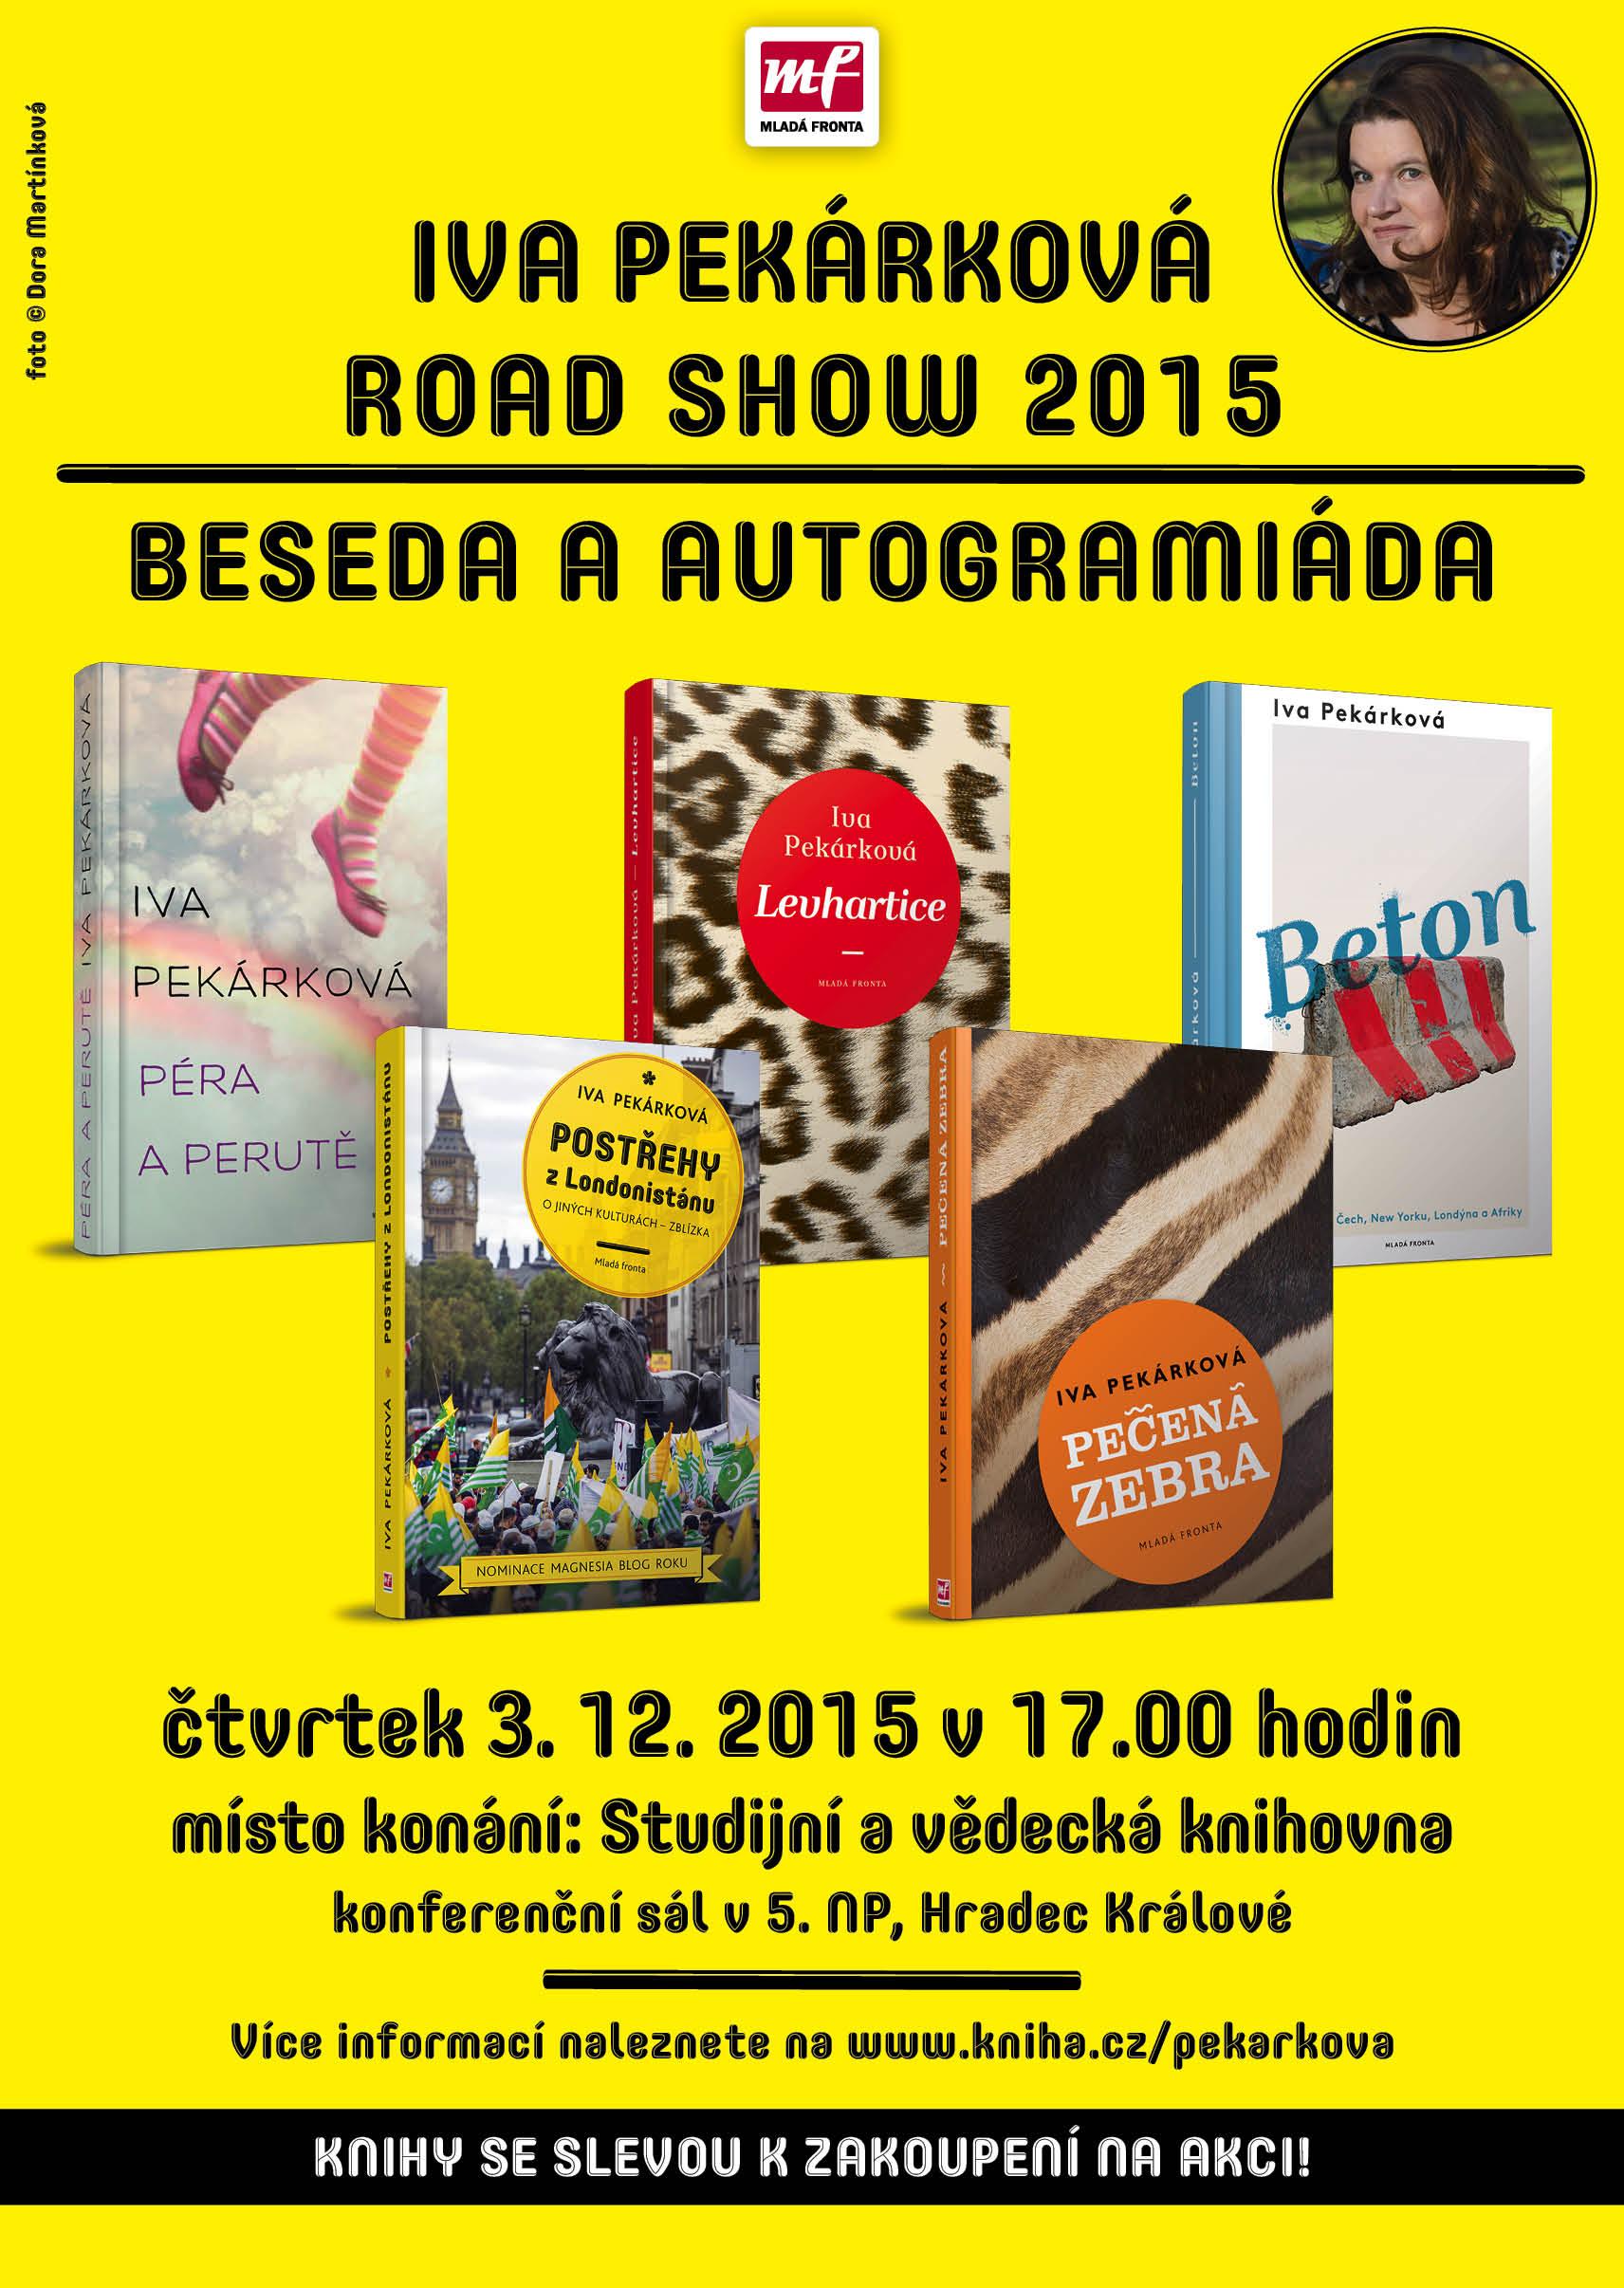 Iva Pekárková ROAD SHOW 2015 - beseda a autogramiáda